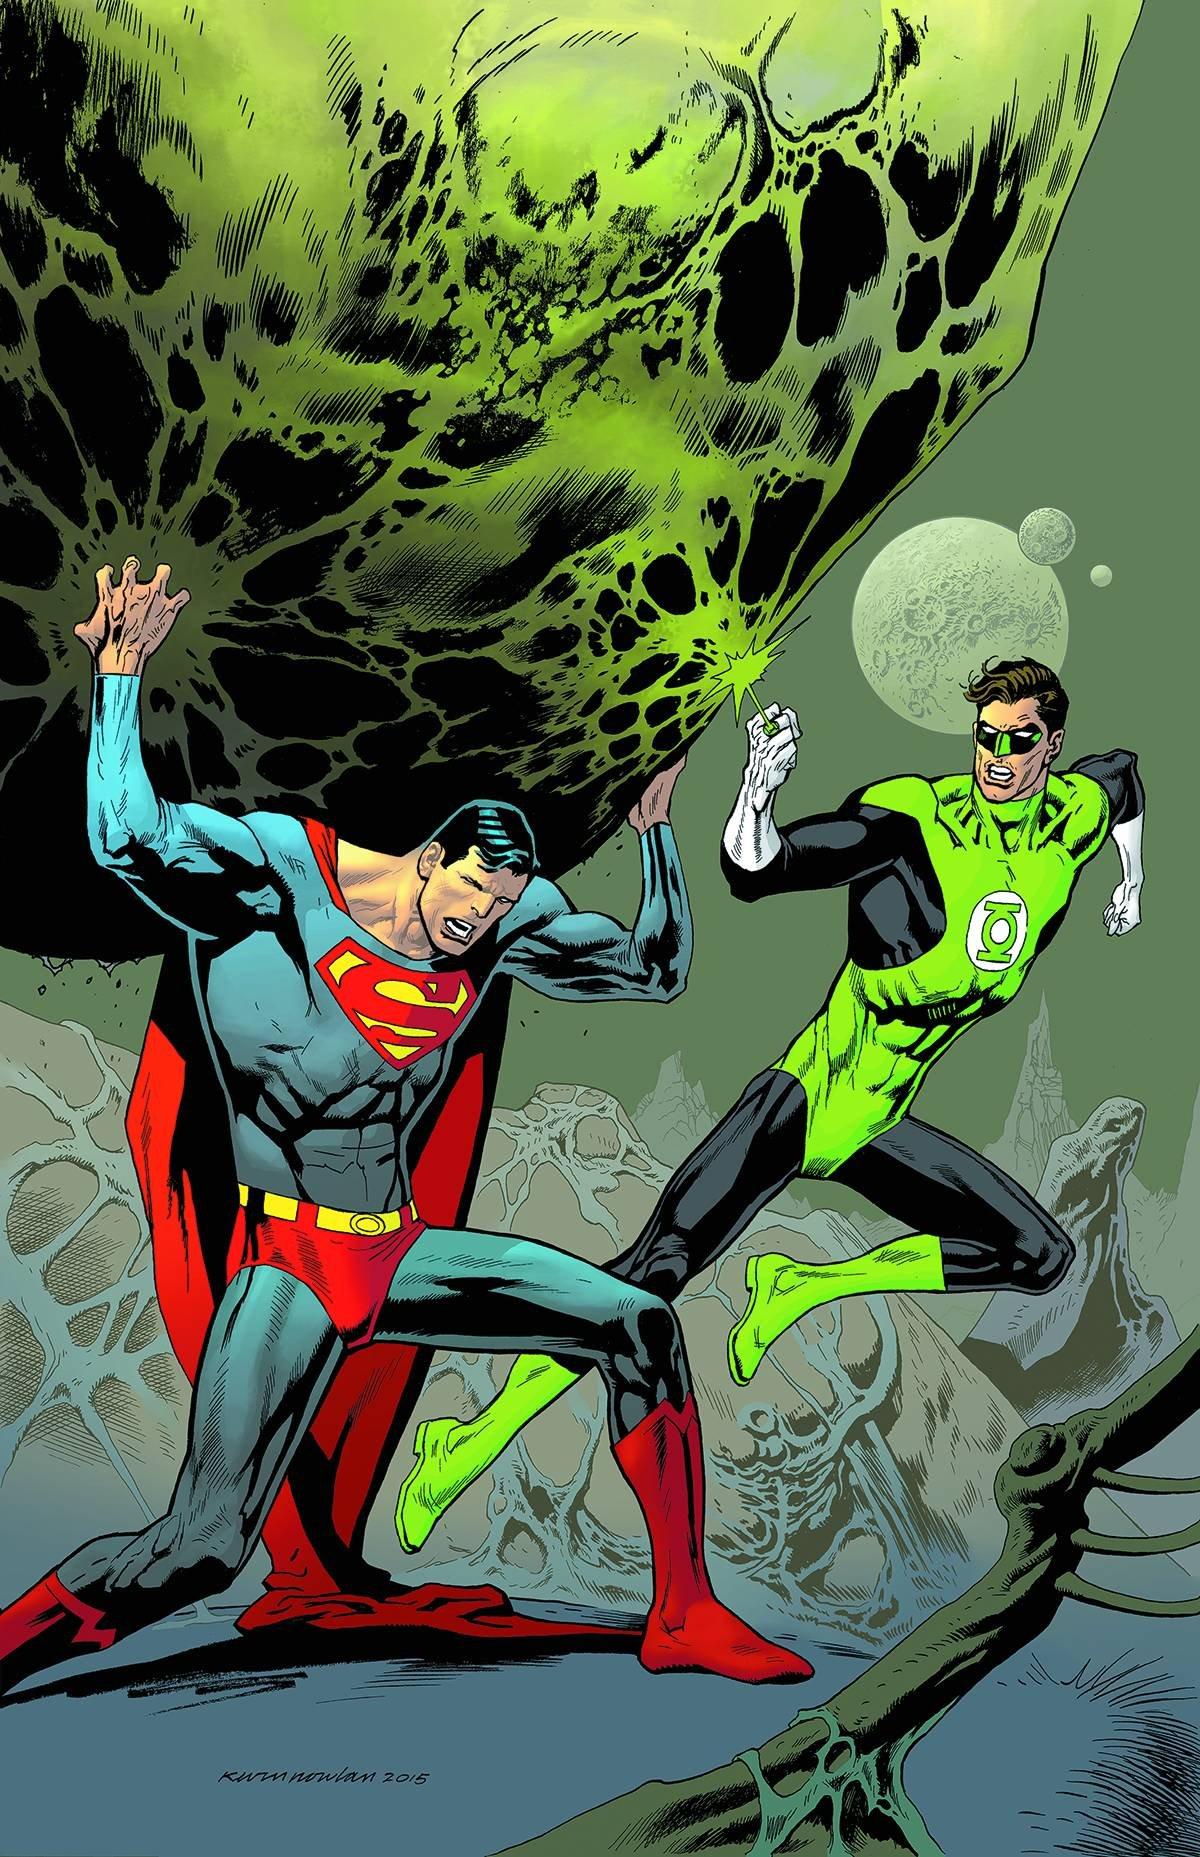 SUPERMAN #44 GREEN LANTERN 75 VAR ED pdf epub